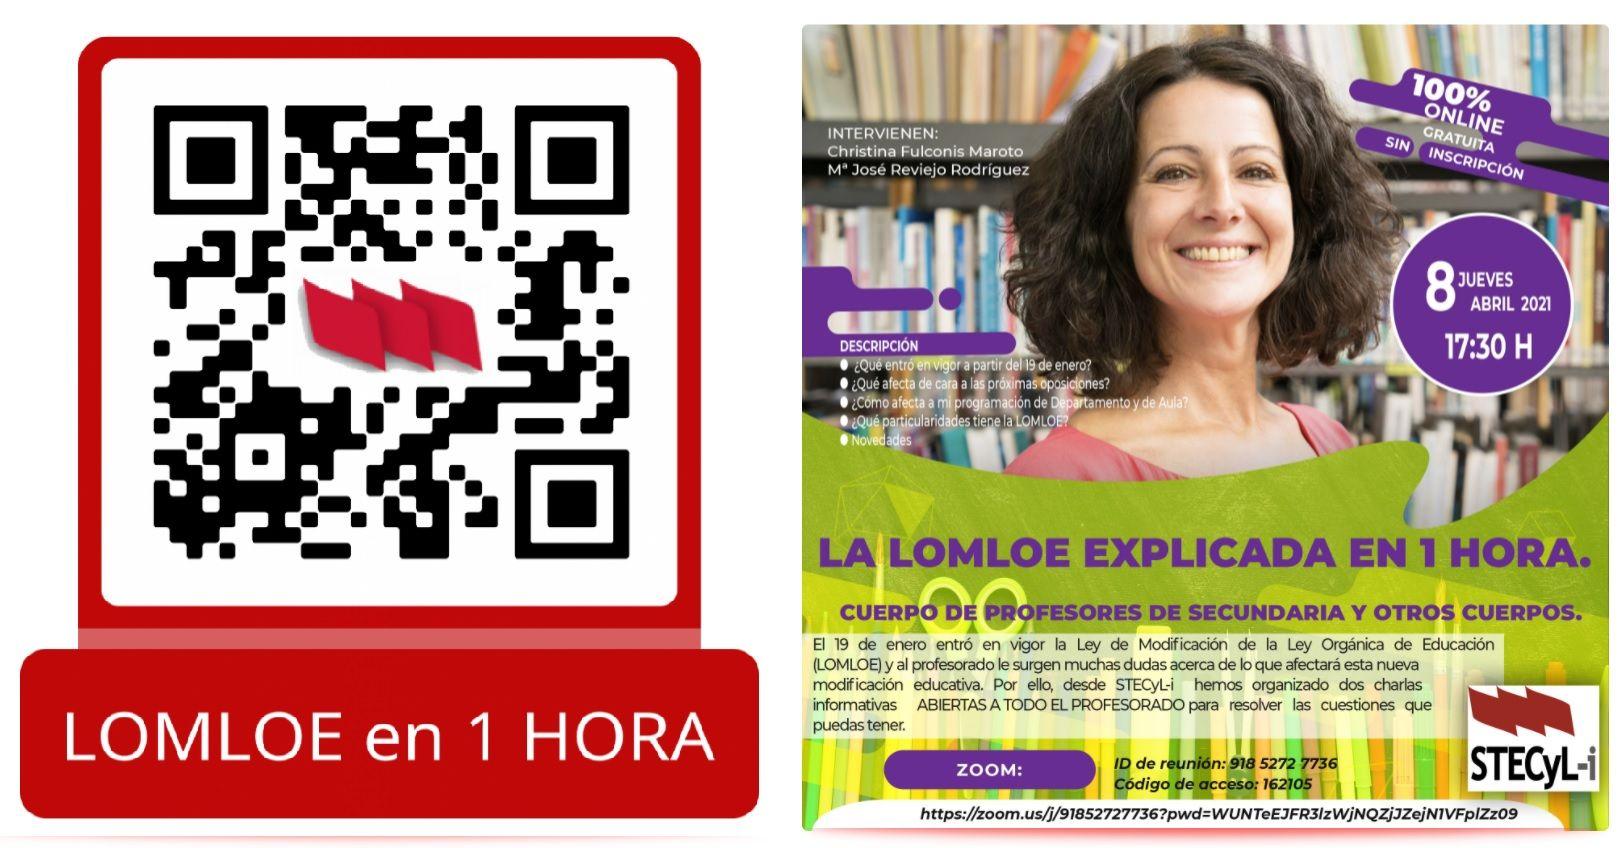 LOMLOE-1HORA-EEMM-QR